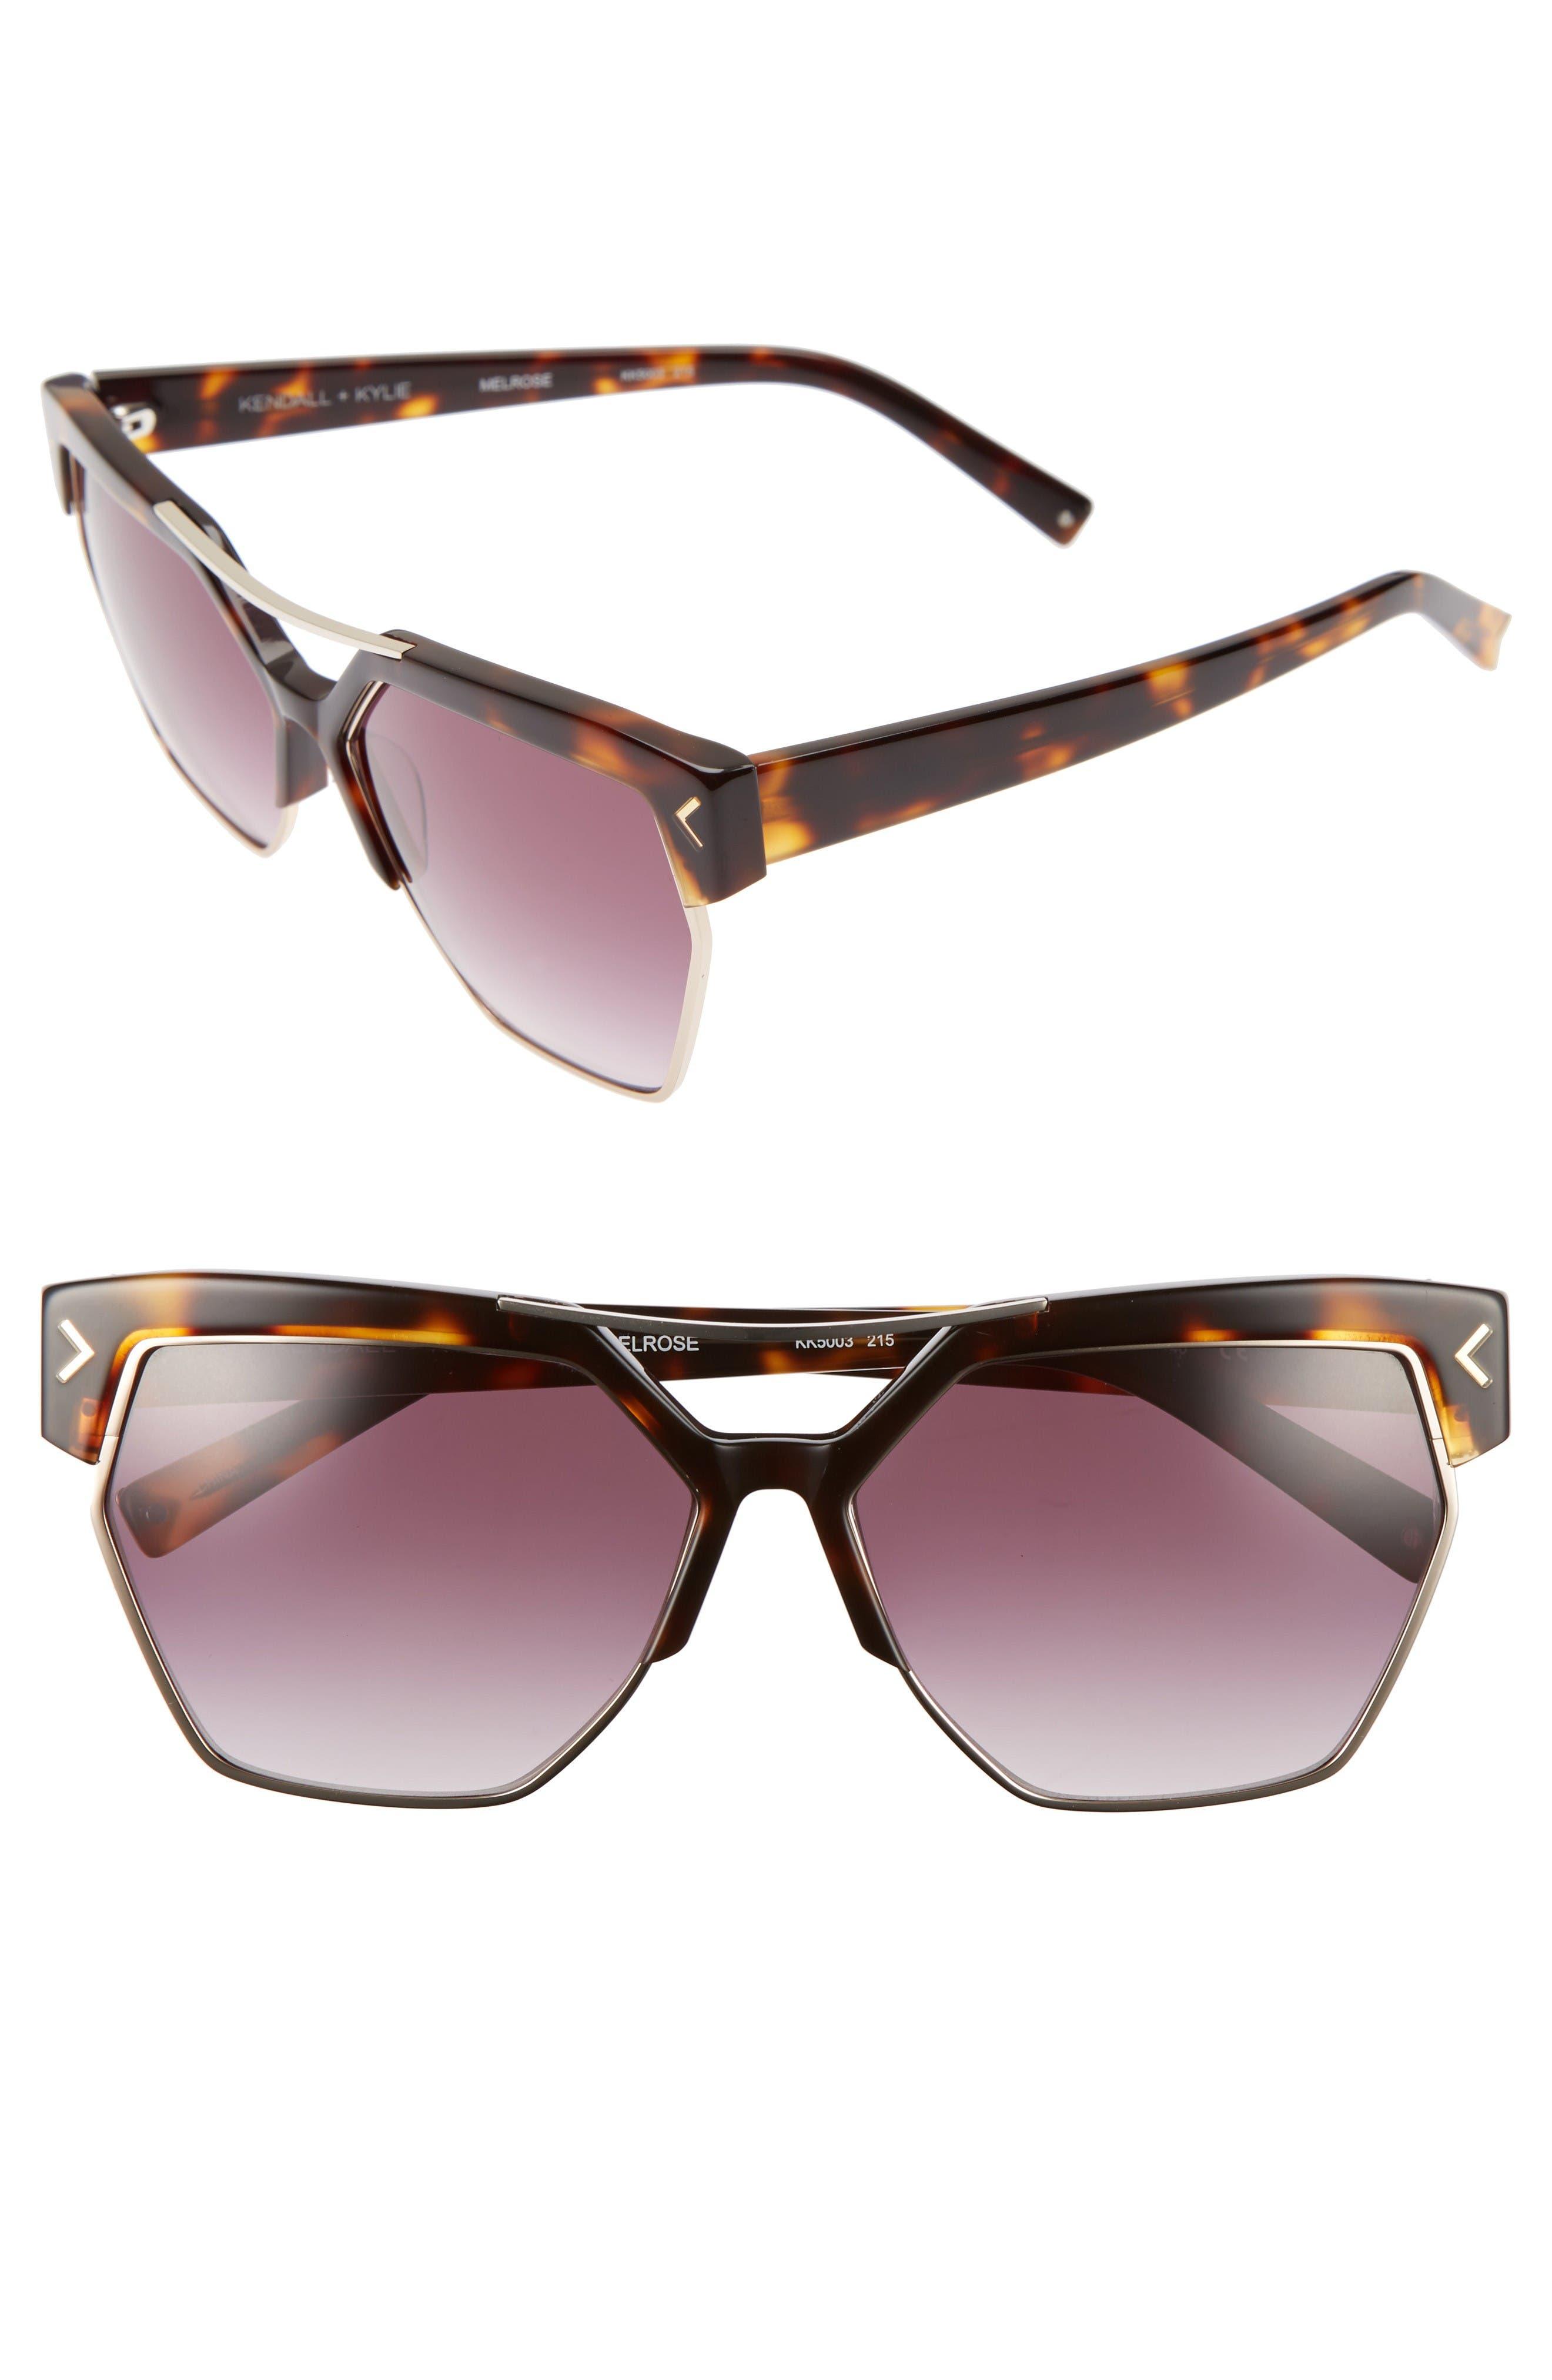 KENDALL + KYLIE 55mm Retro Sunglasses